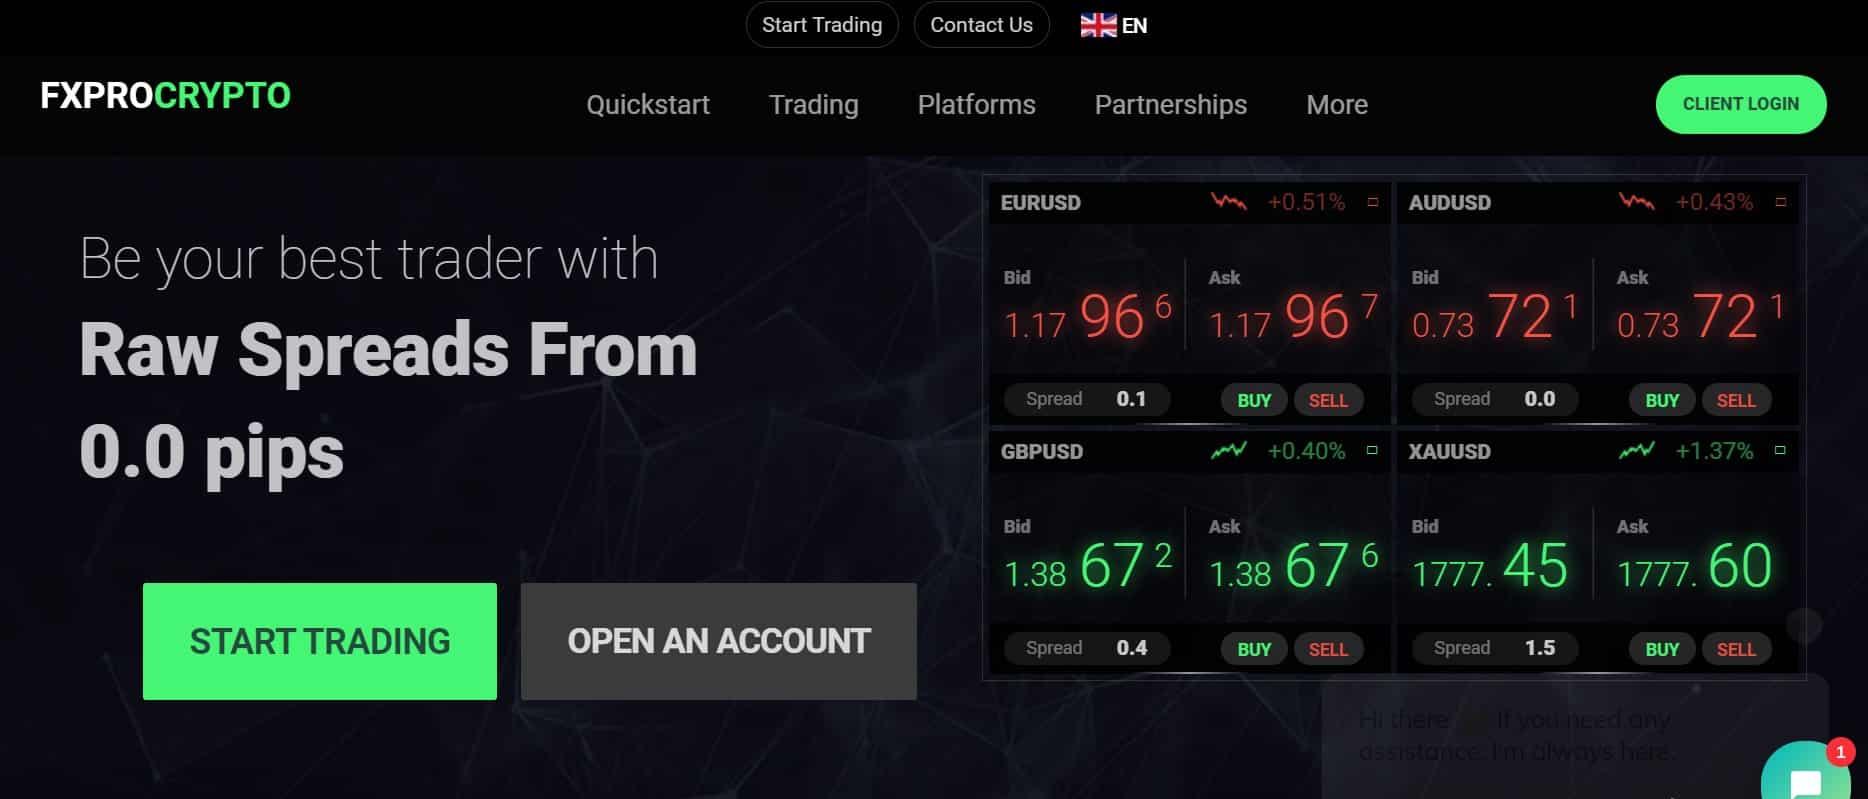 Fxprocrypto website